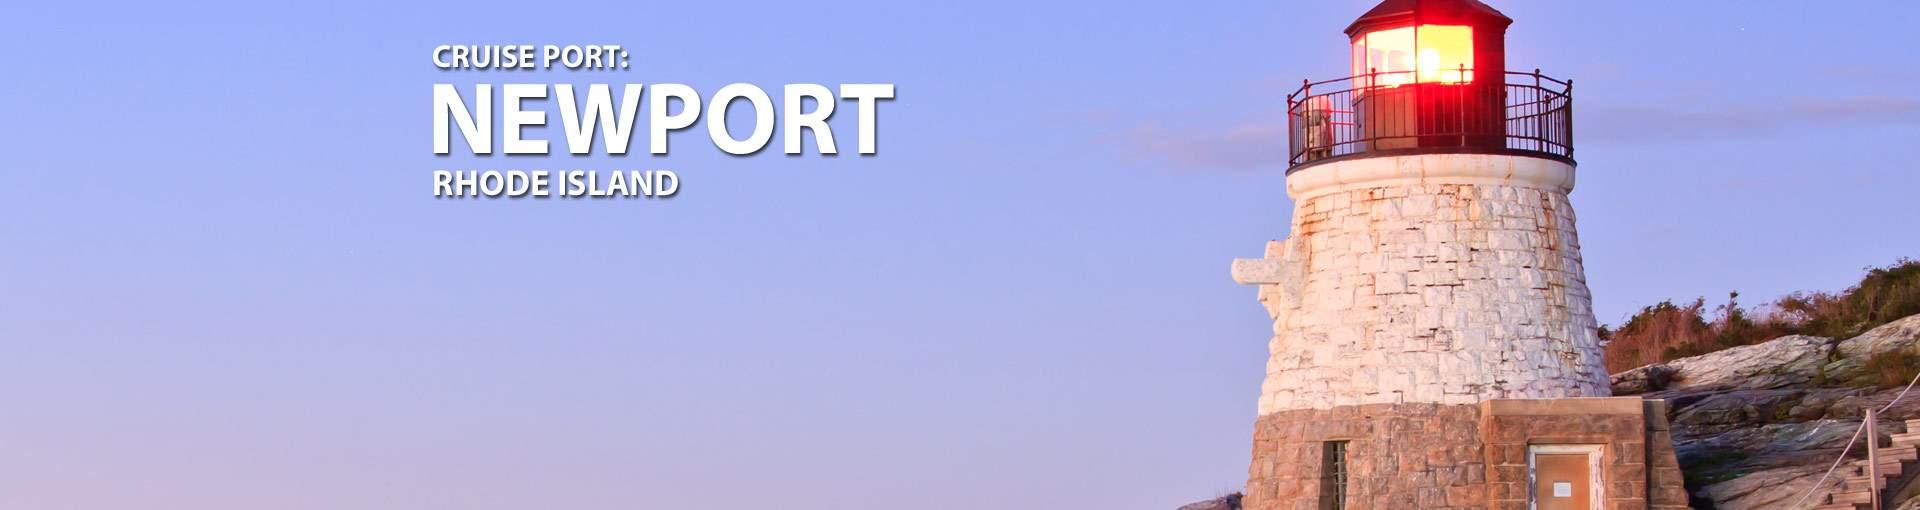 Cruise Port: Newport, Rhode Island